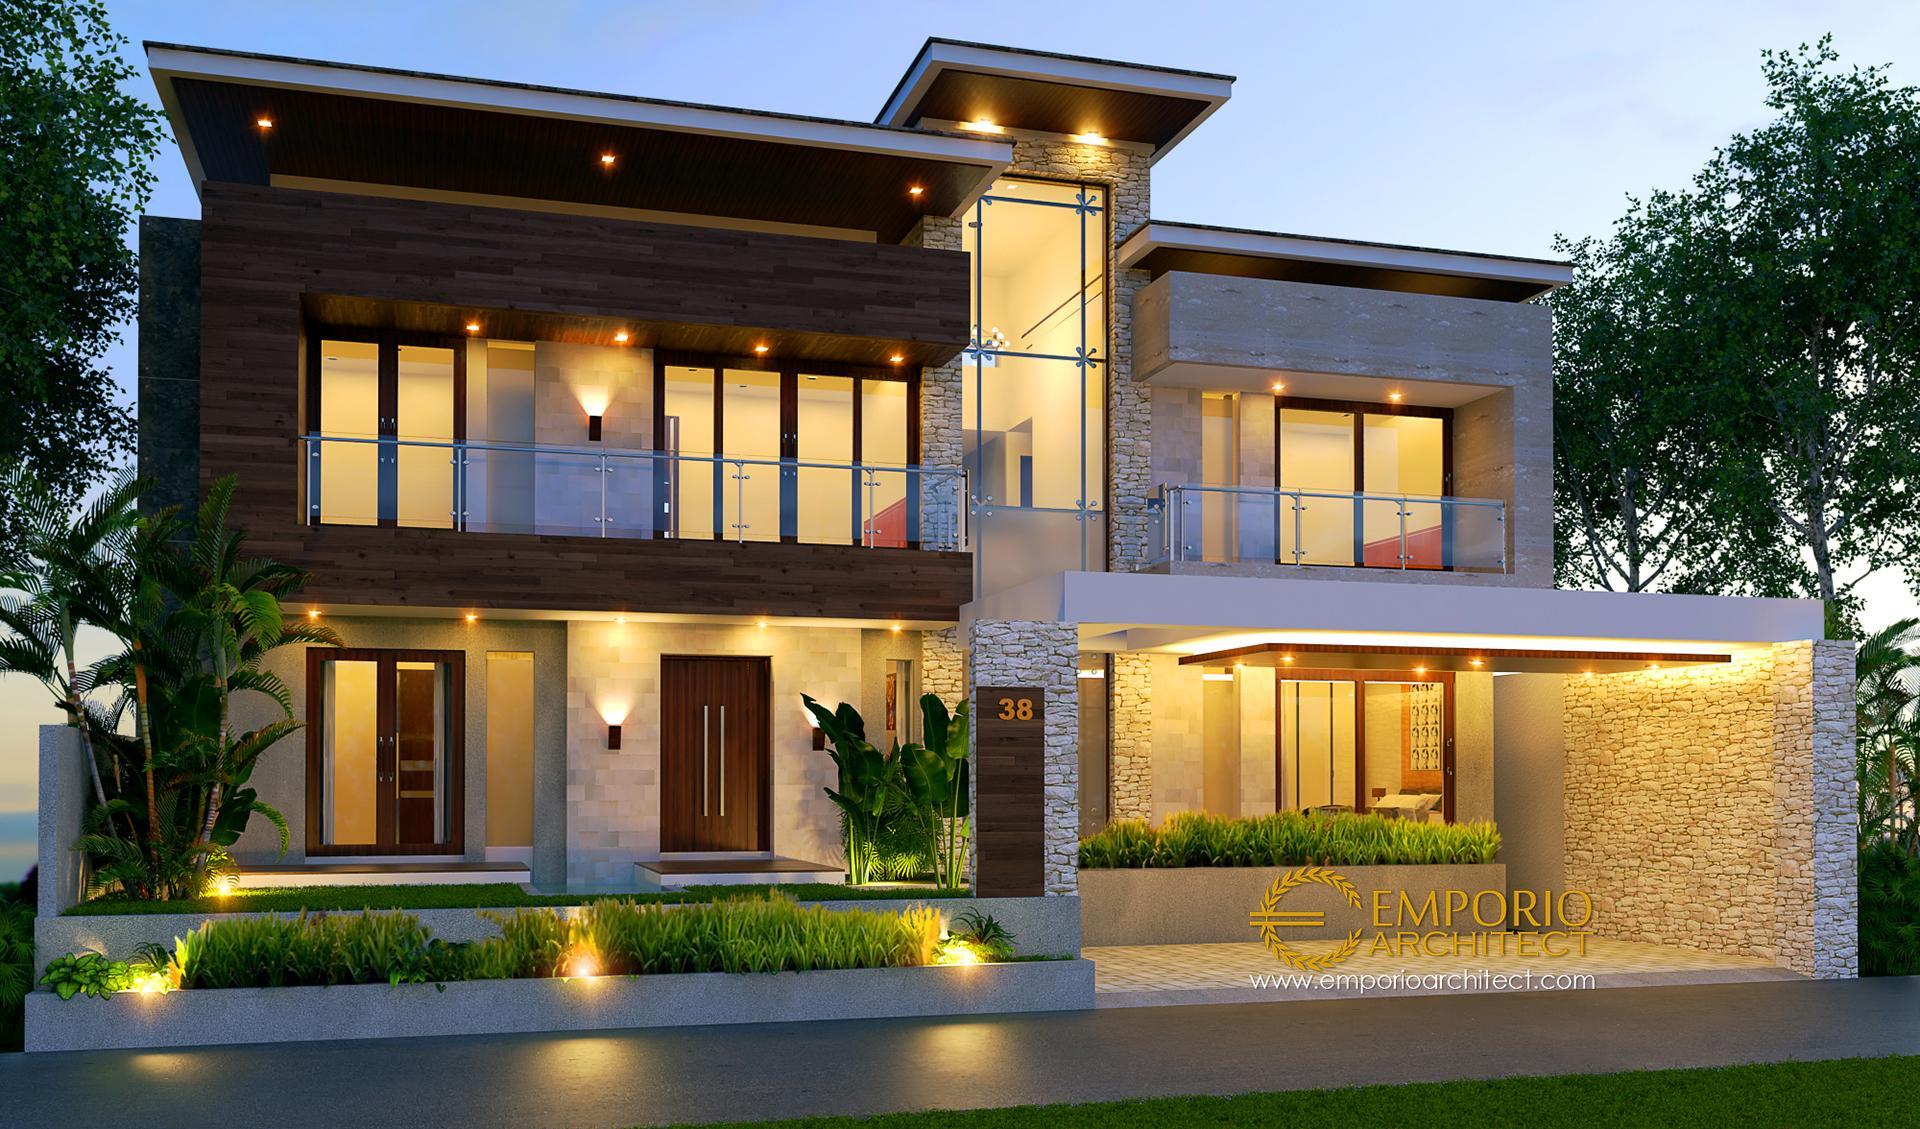 Mrs. Weni Modern House 2 Floors Design - Tanjung Selor, Kalimantan Utara